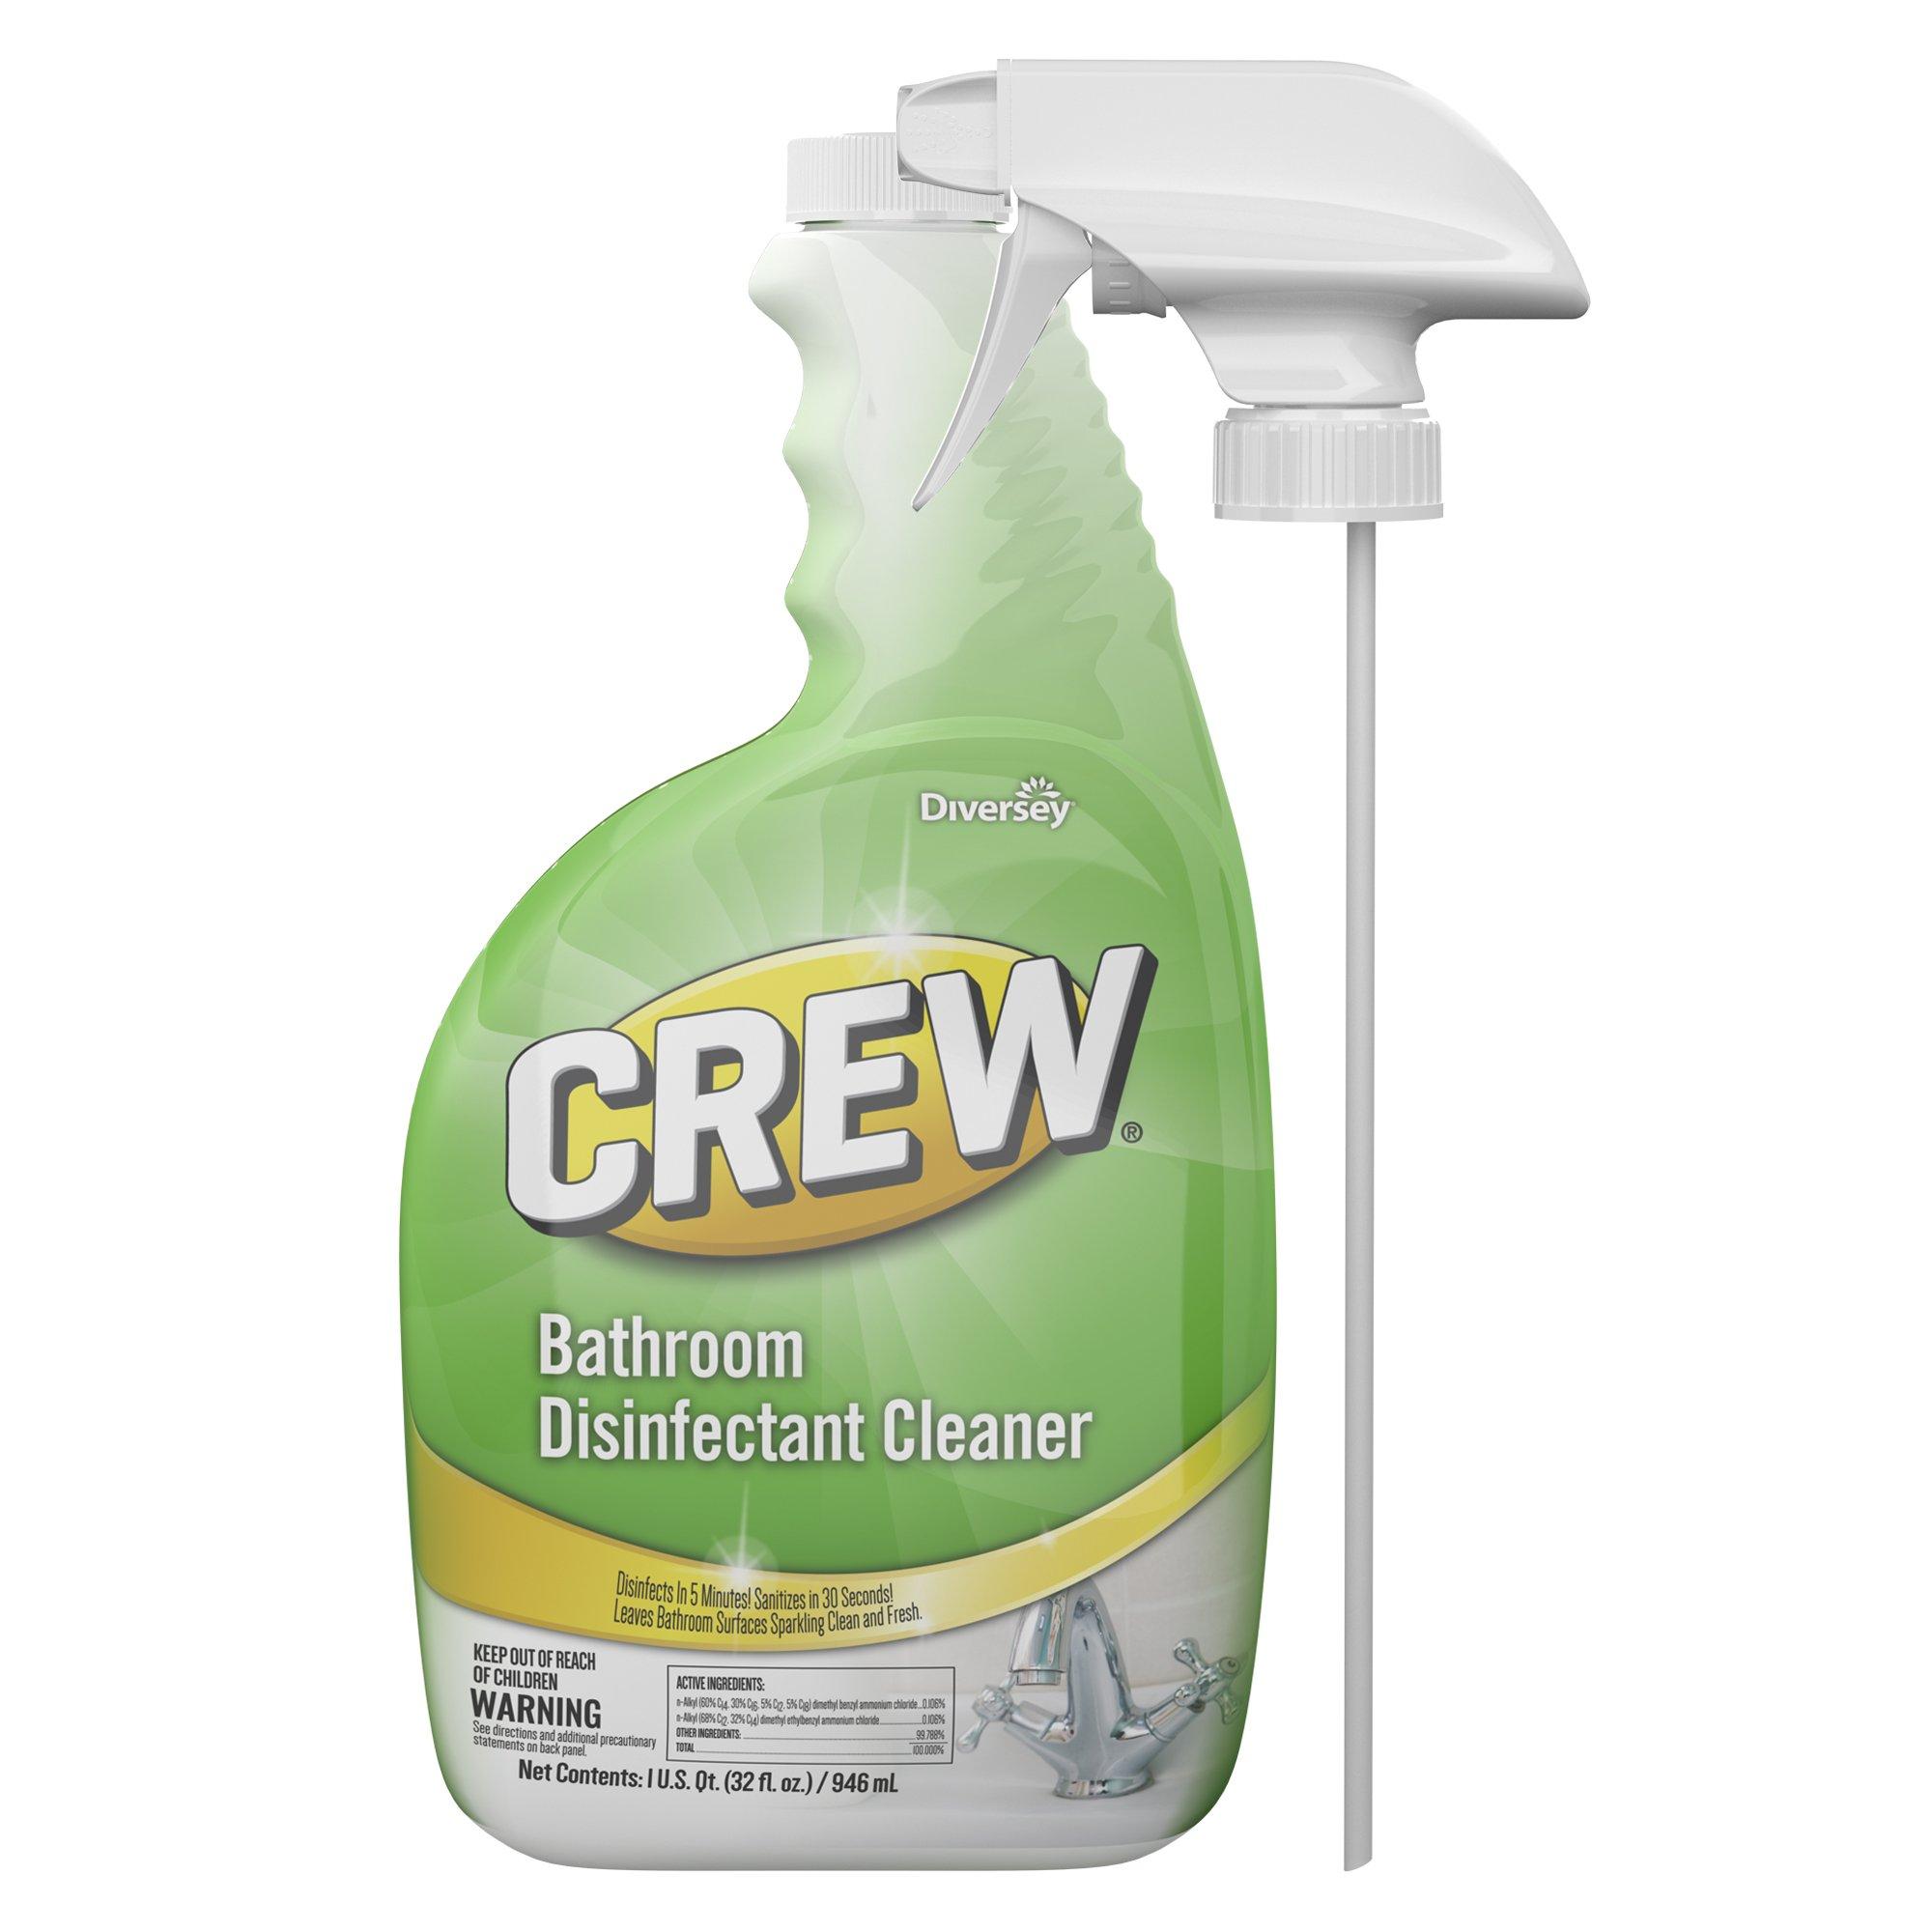 Diversey Crew Bathroom Disinfectant Cleaner - Leaves Bathroom Surfaces Sparkling Clean, Fresh Floral Scent - 32 oz. RTU Bottle (4 Pack)